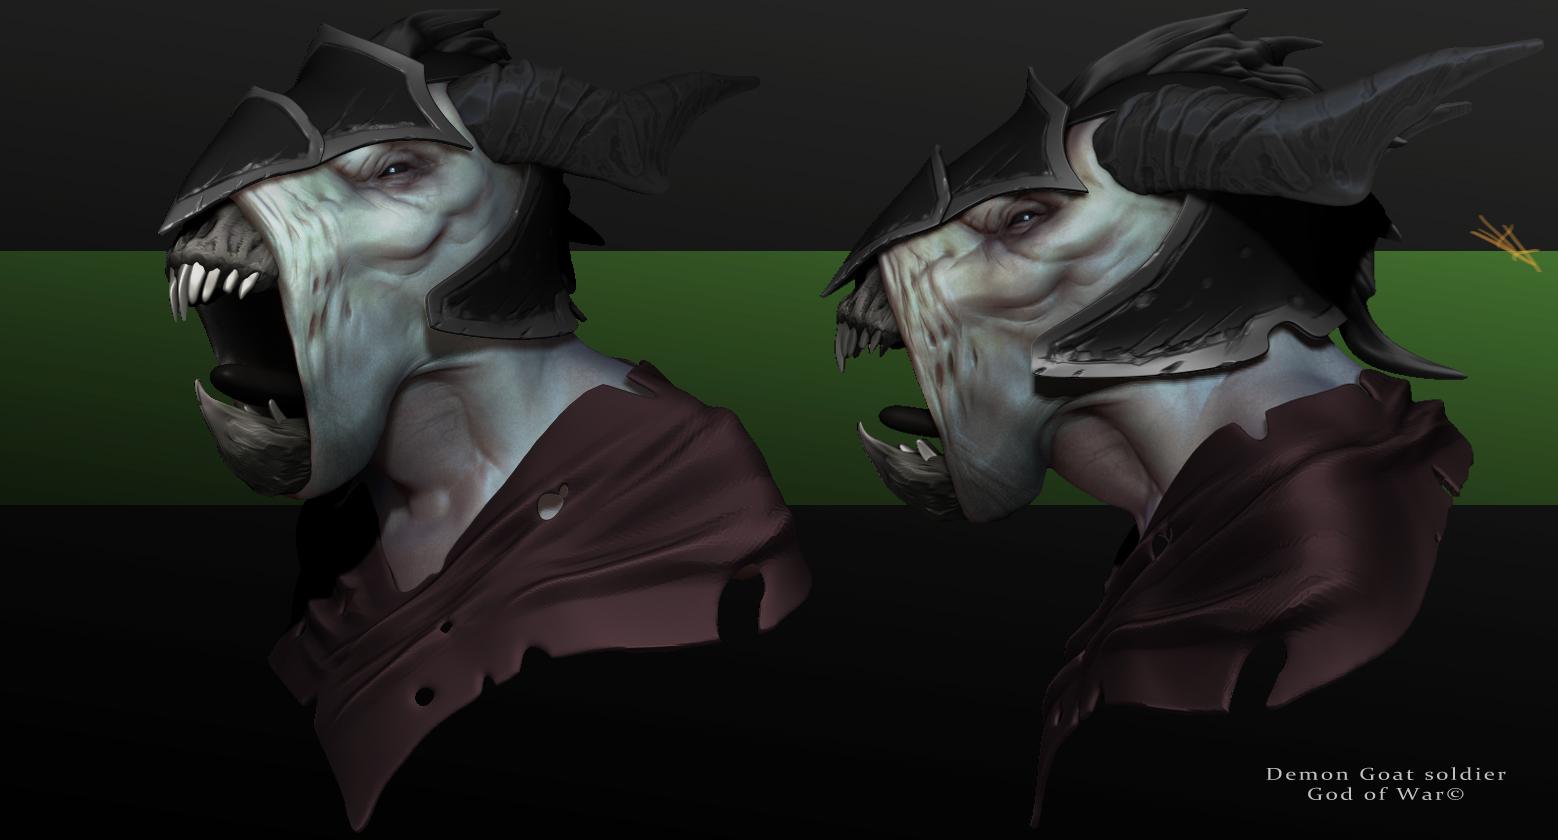 god_of_war_demon_goat_soldier_by_dimidevos-d5yx7oq.jpg